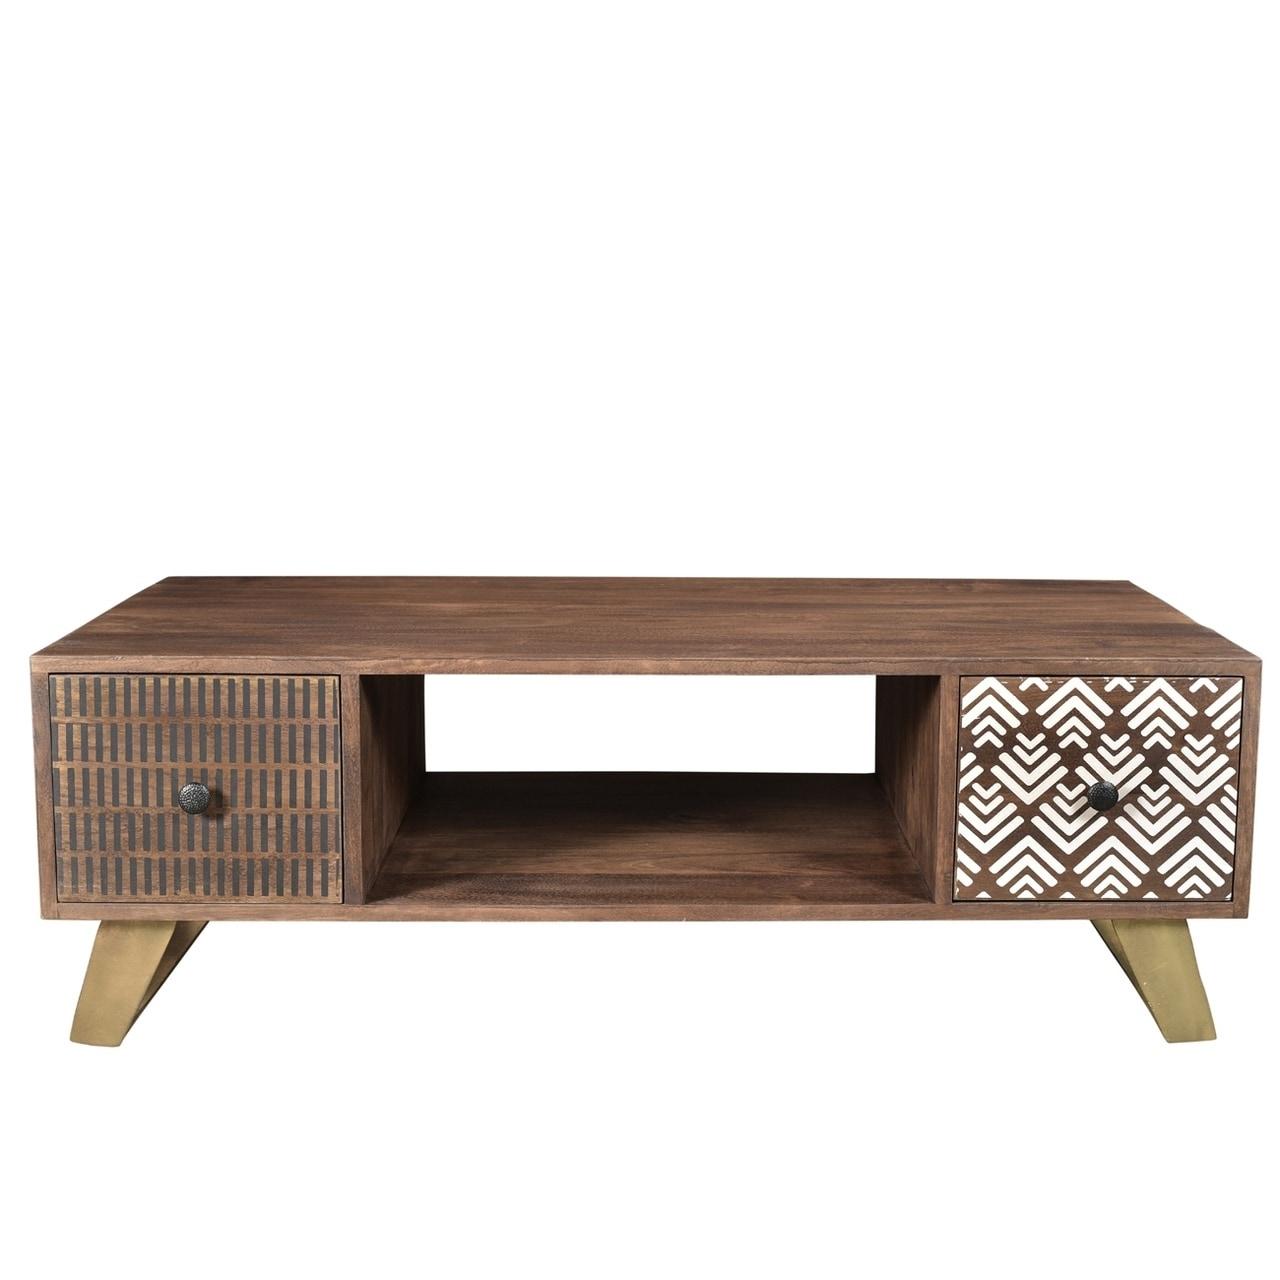 Handmade Olga Retro Coffee Table 46 X 24 16 India